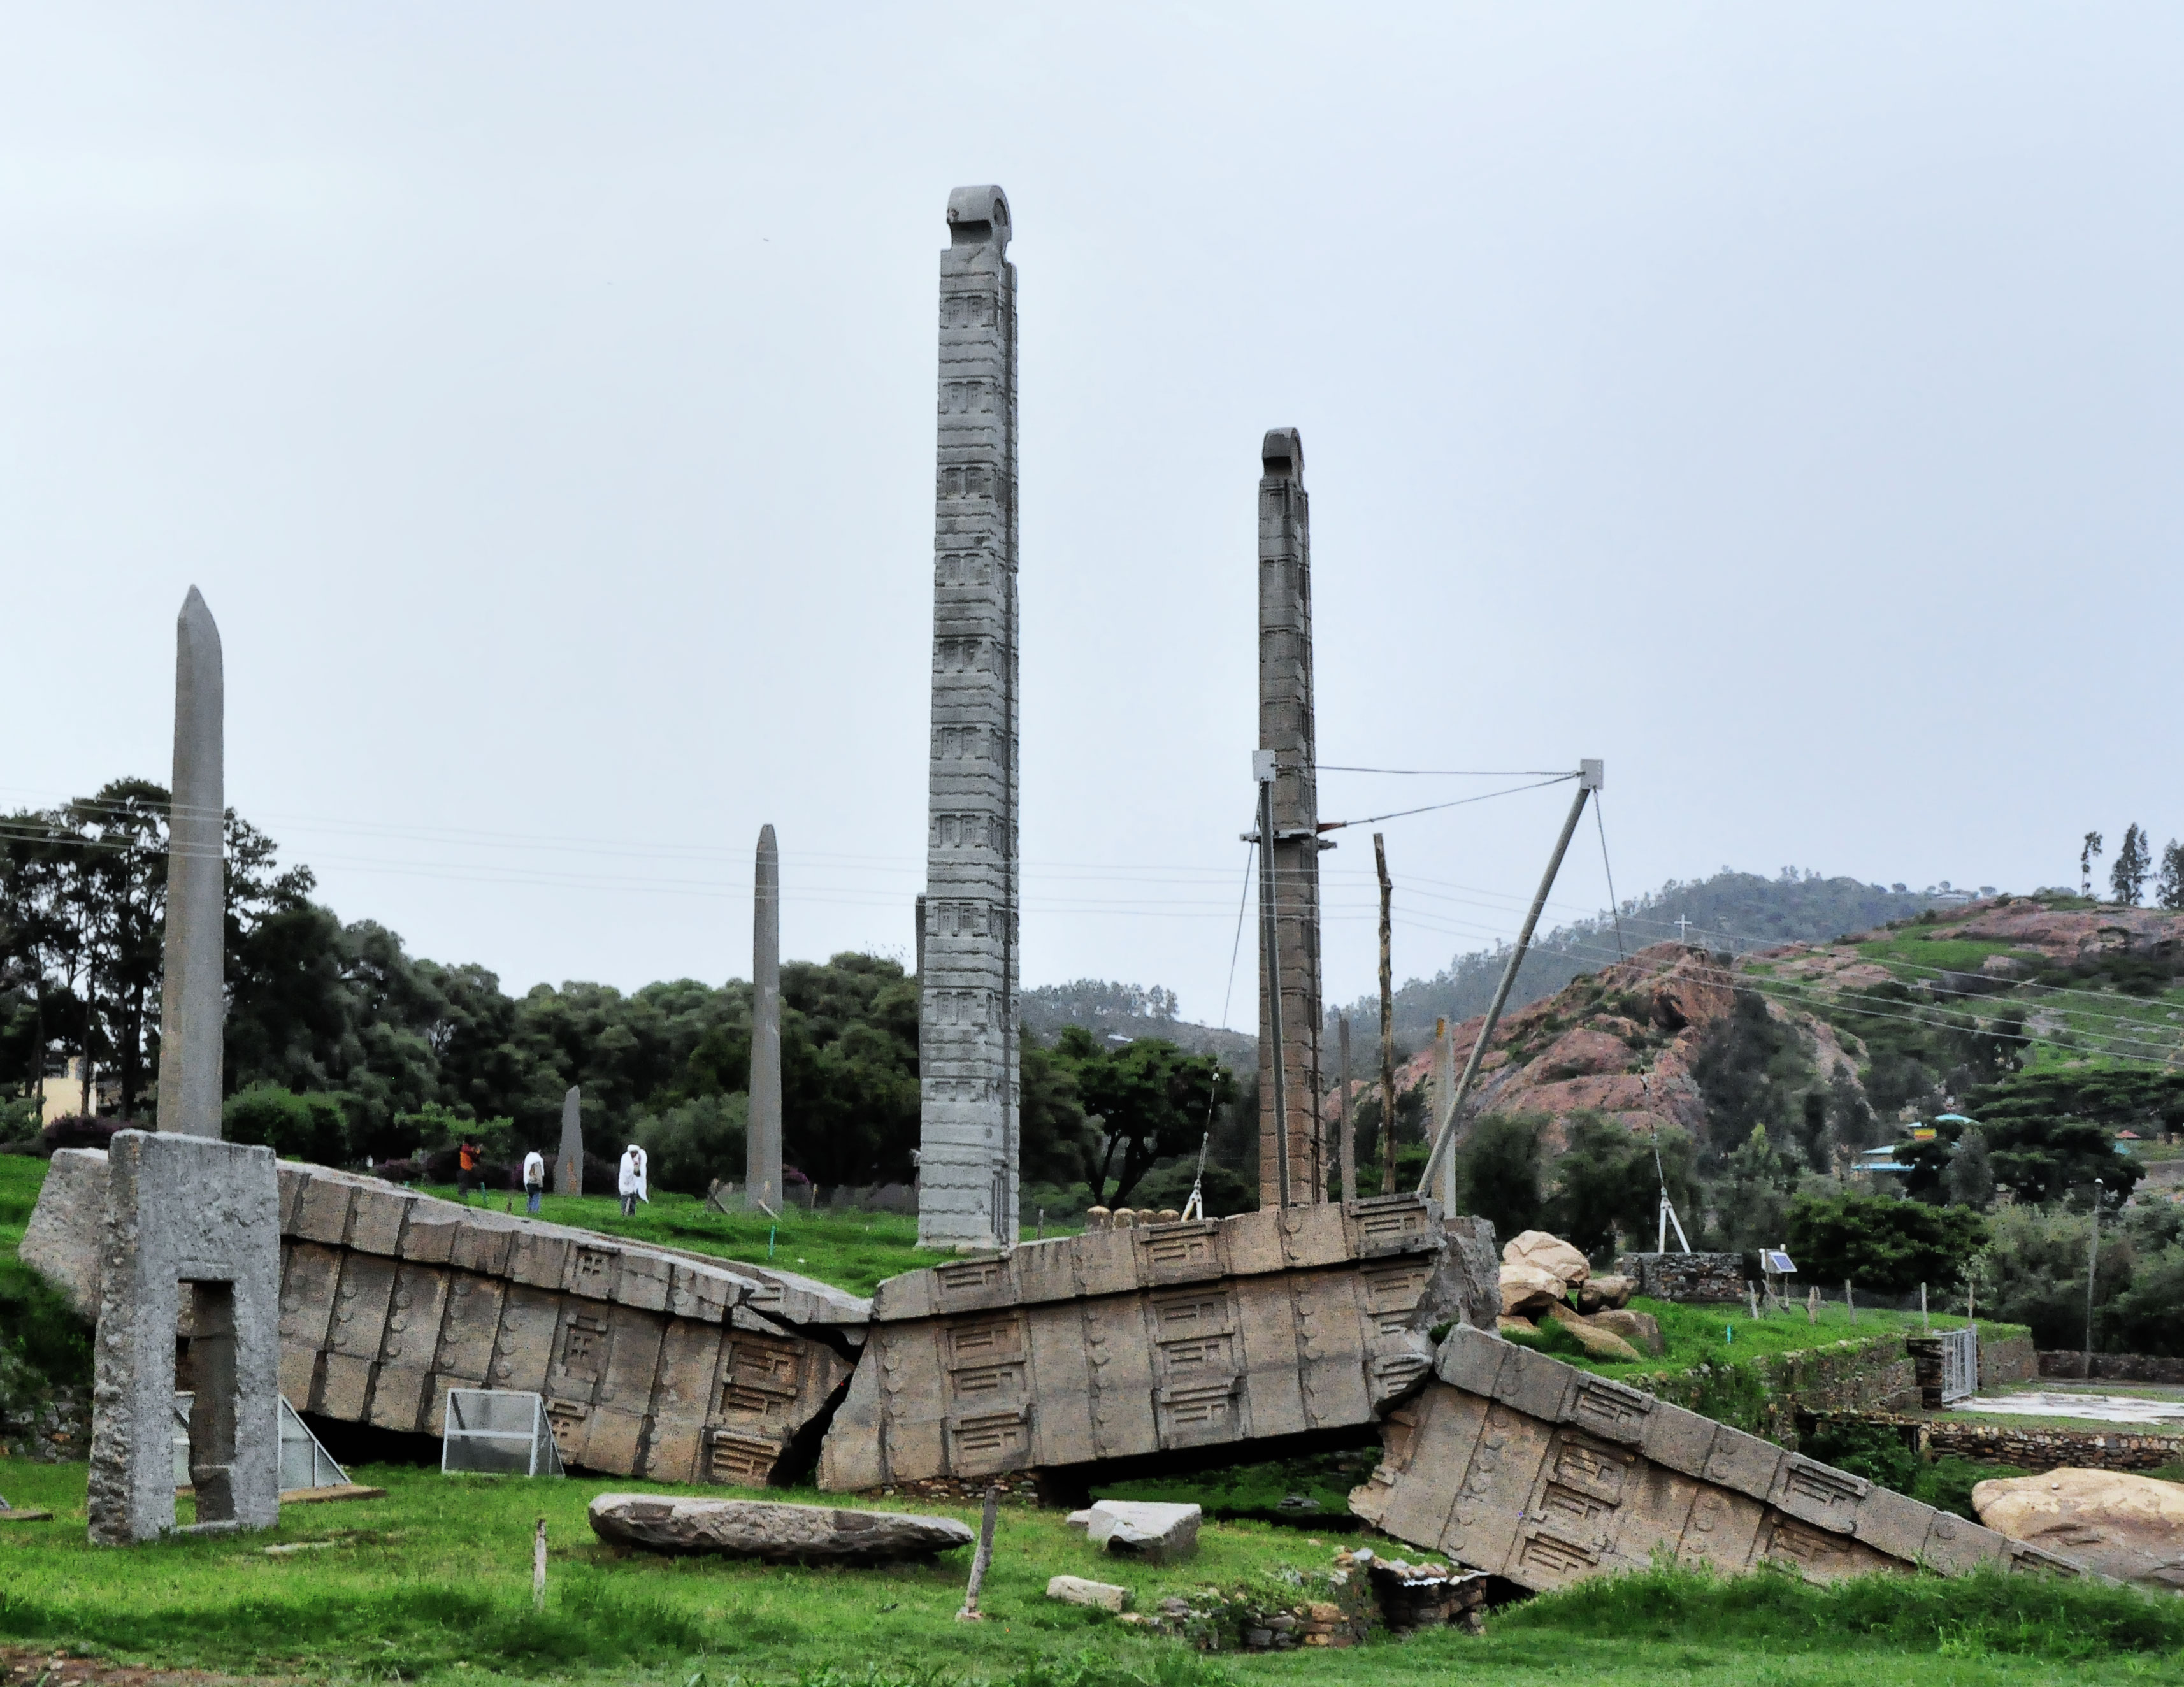 Stelae,_Aksum,_Ethiopia_(7158408756)